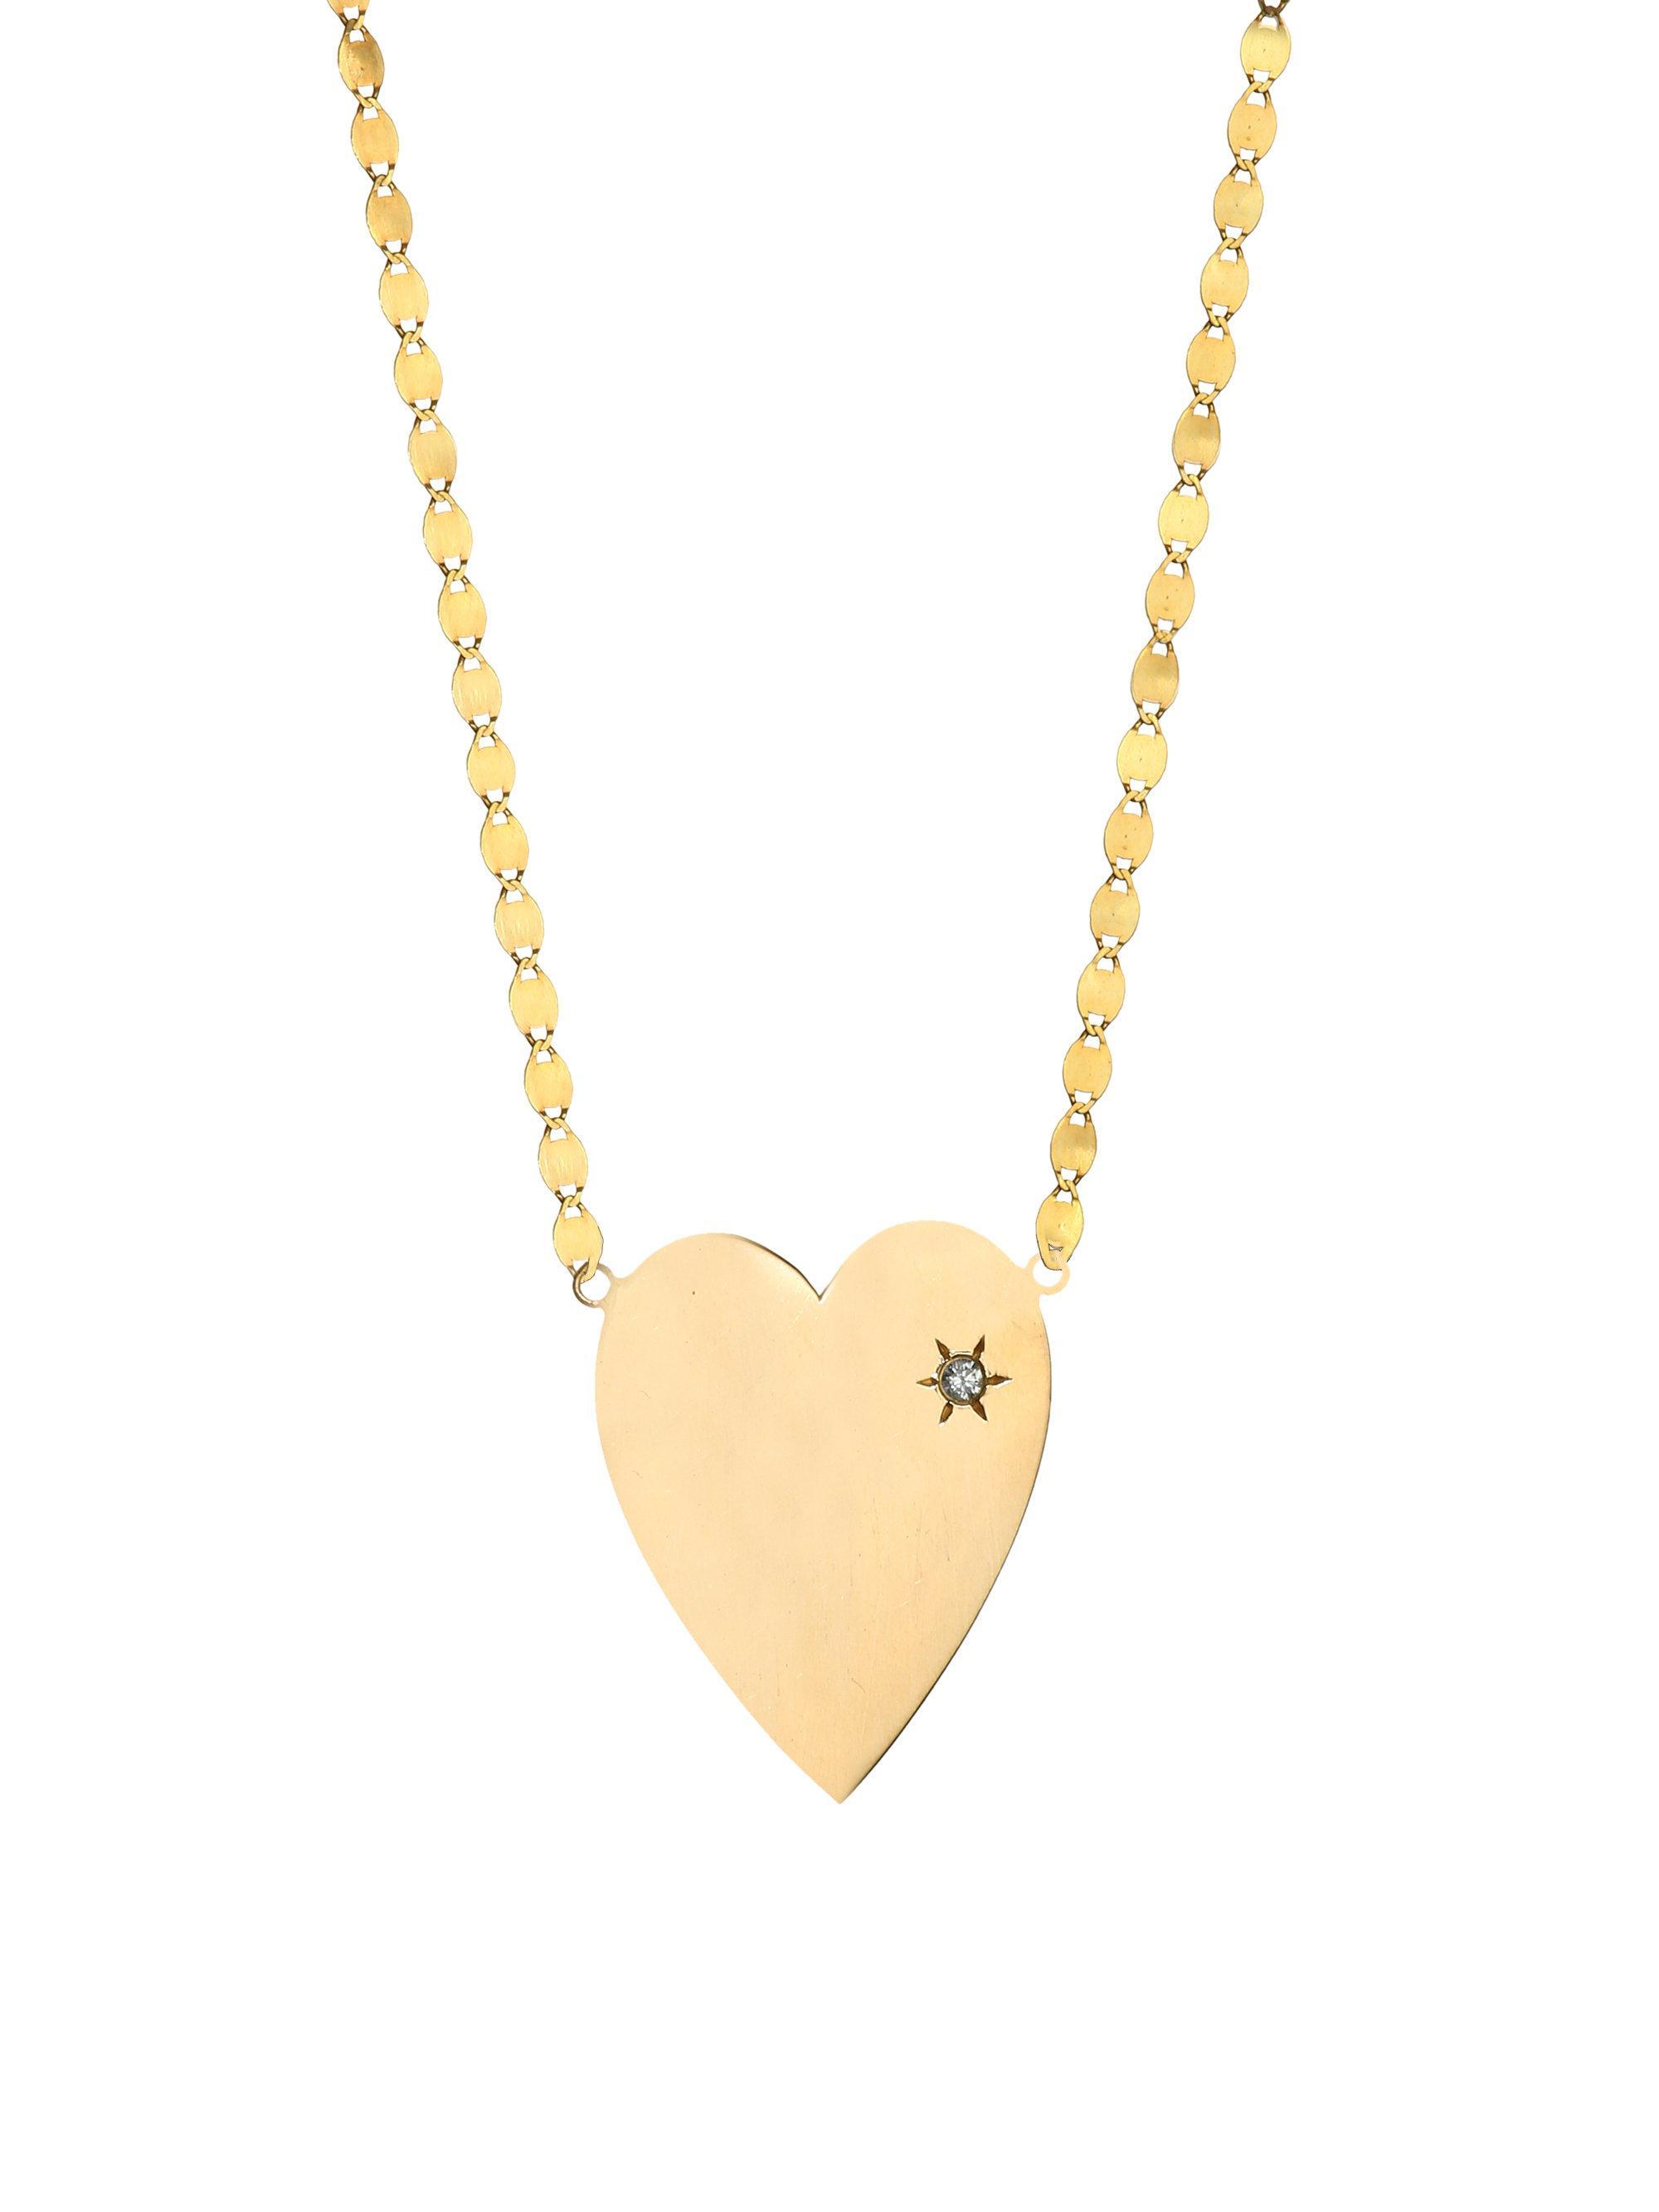 Lana Jewelry 14k Large Heart Pendant Necklace w/ Pink Sapphire HYYgYv